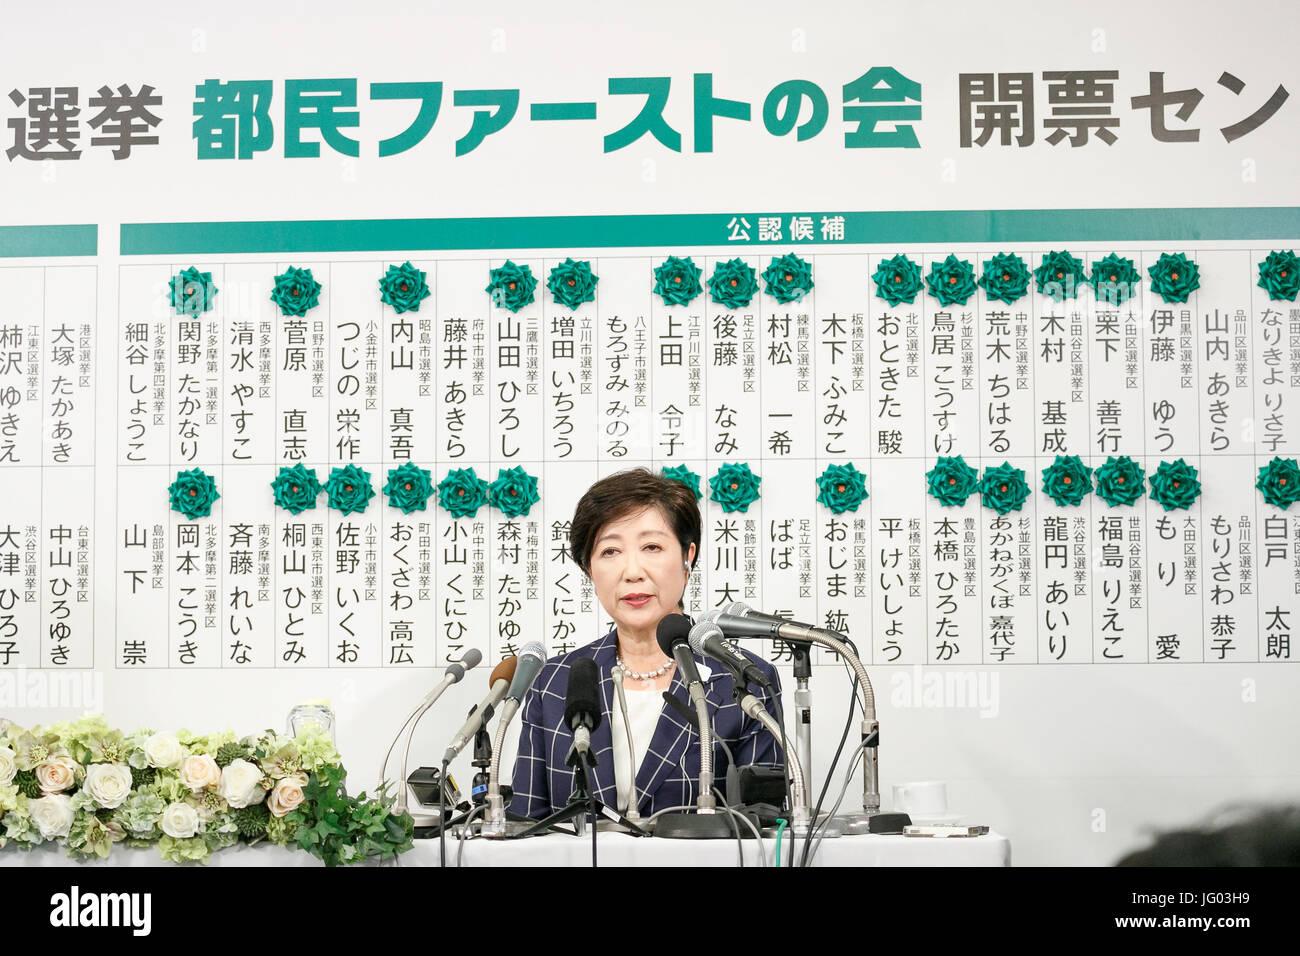 Tokyo Governor Yuriko Koike answers questions from the media at the Shinjuku Washington Hotel on July 2, 2017, Tokyo, - Stock Image